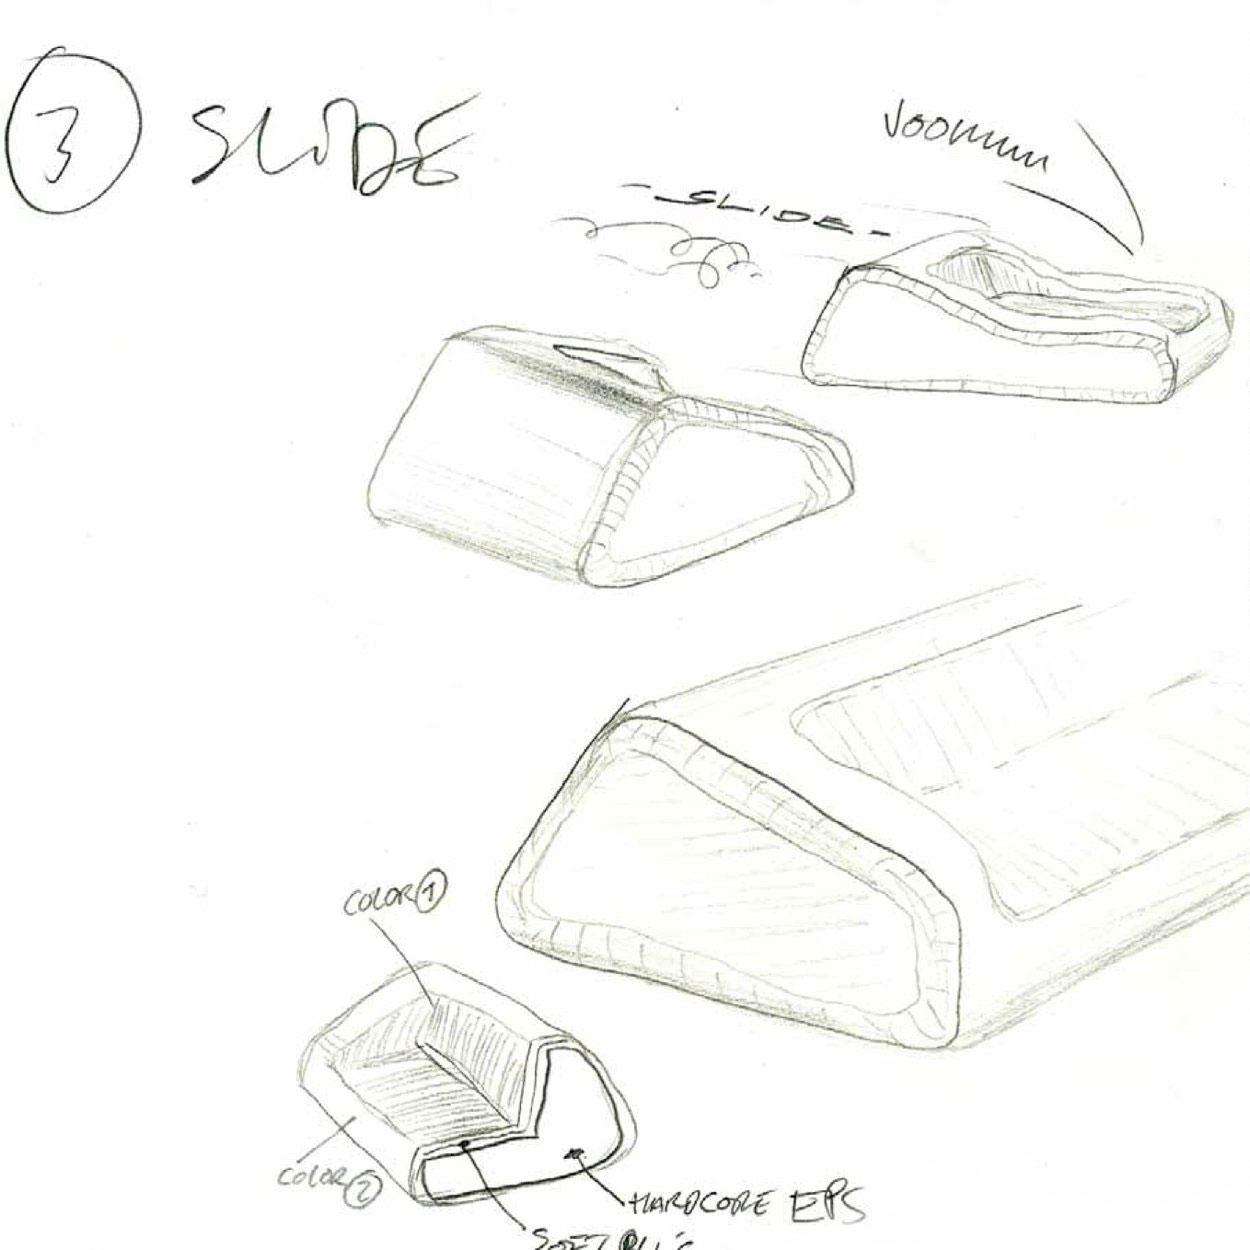 Sketch of mormor sofa explaining the design concept of the sofa developed for HAY